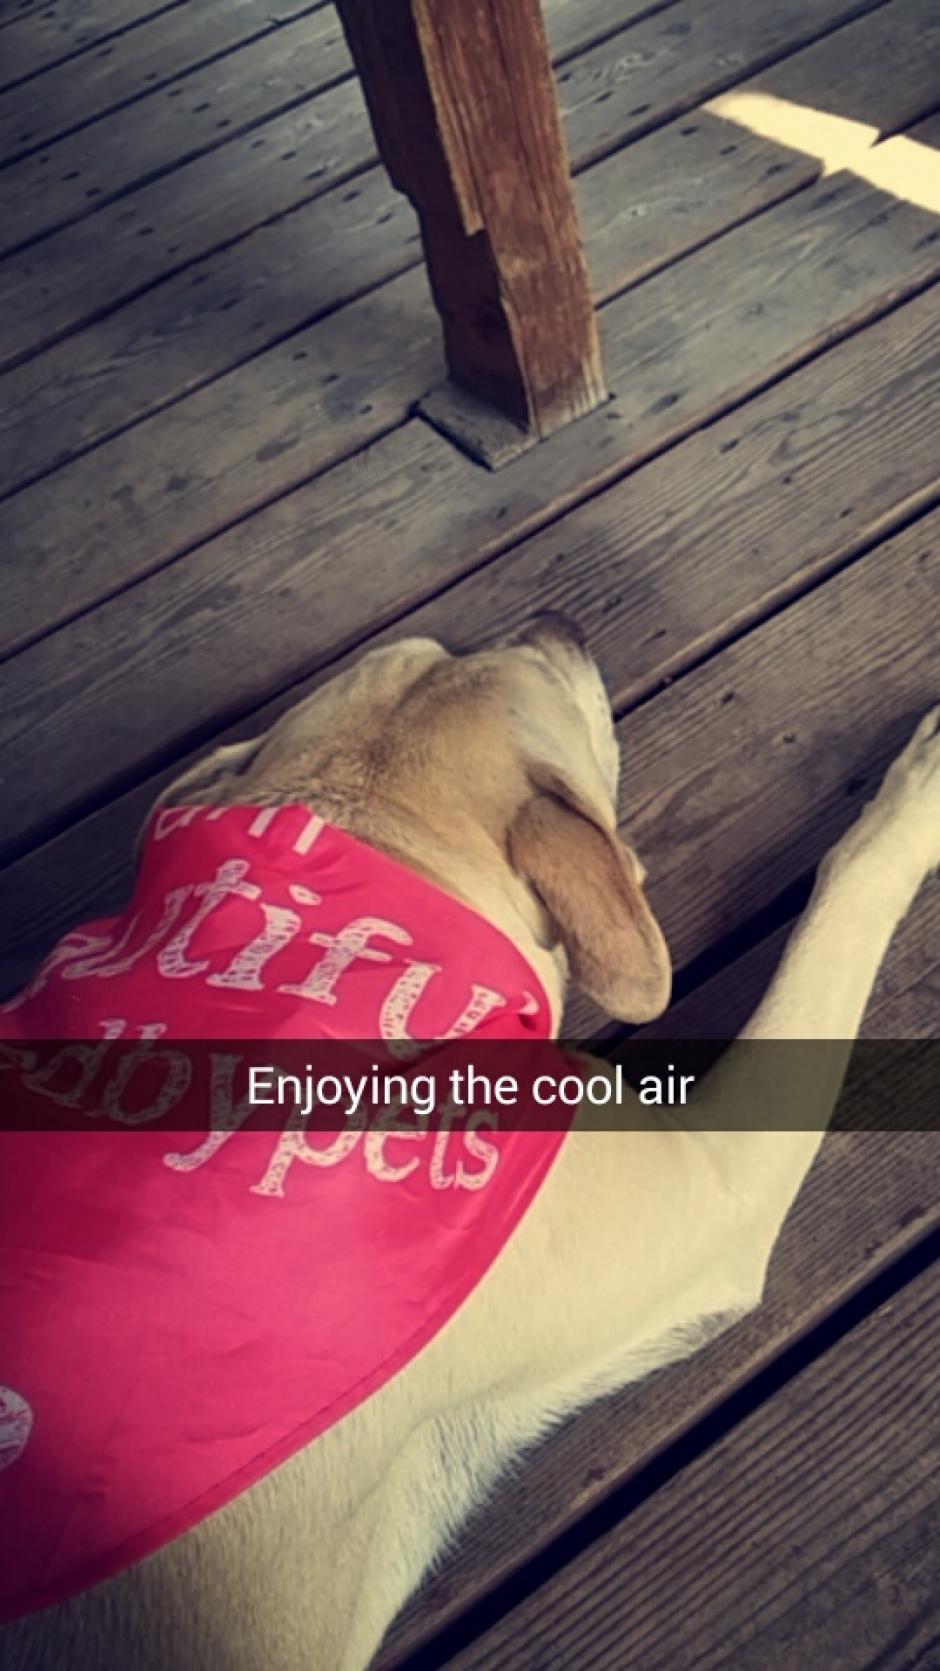 Disfrutó un momento de descanso. (Foto: Snapchat)